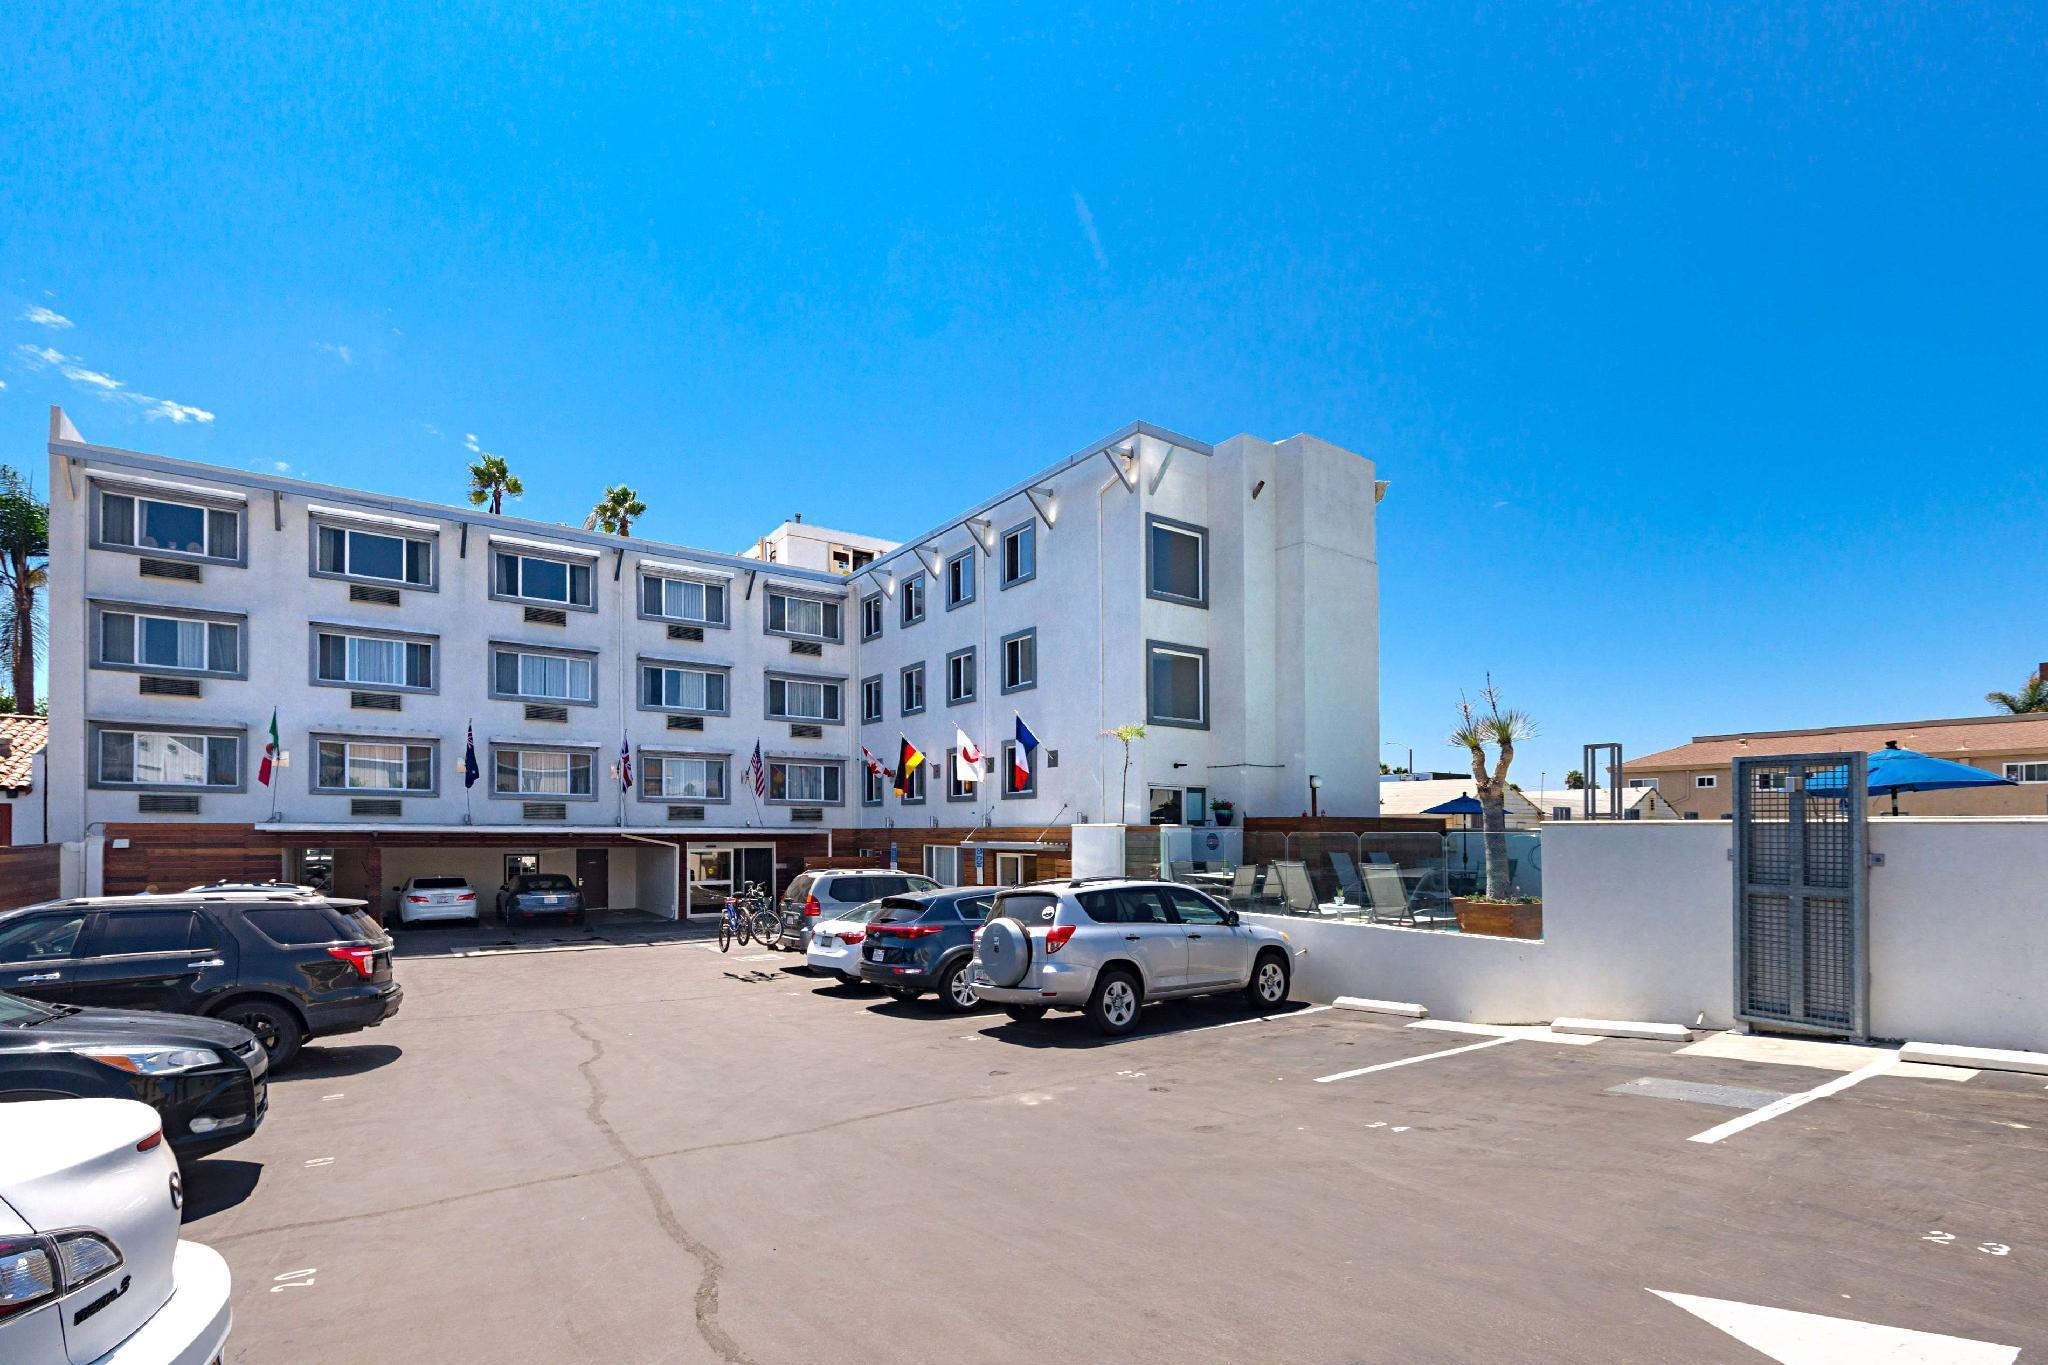 Hotel Solarena BW Premier Collection, Newport Beach (CA